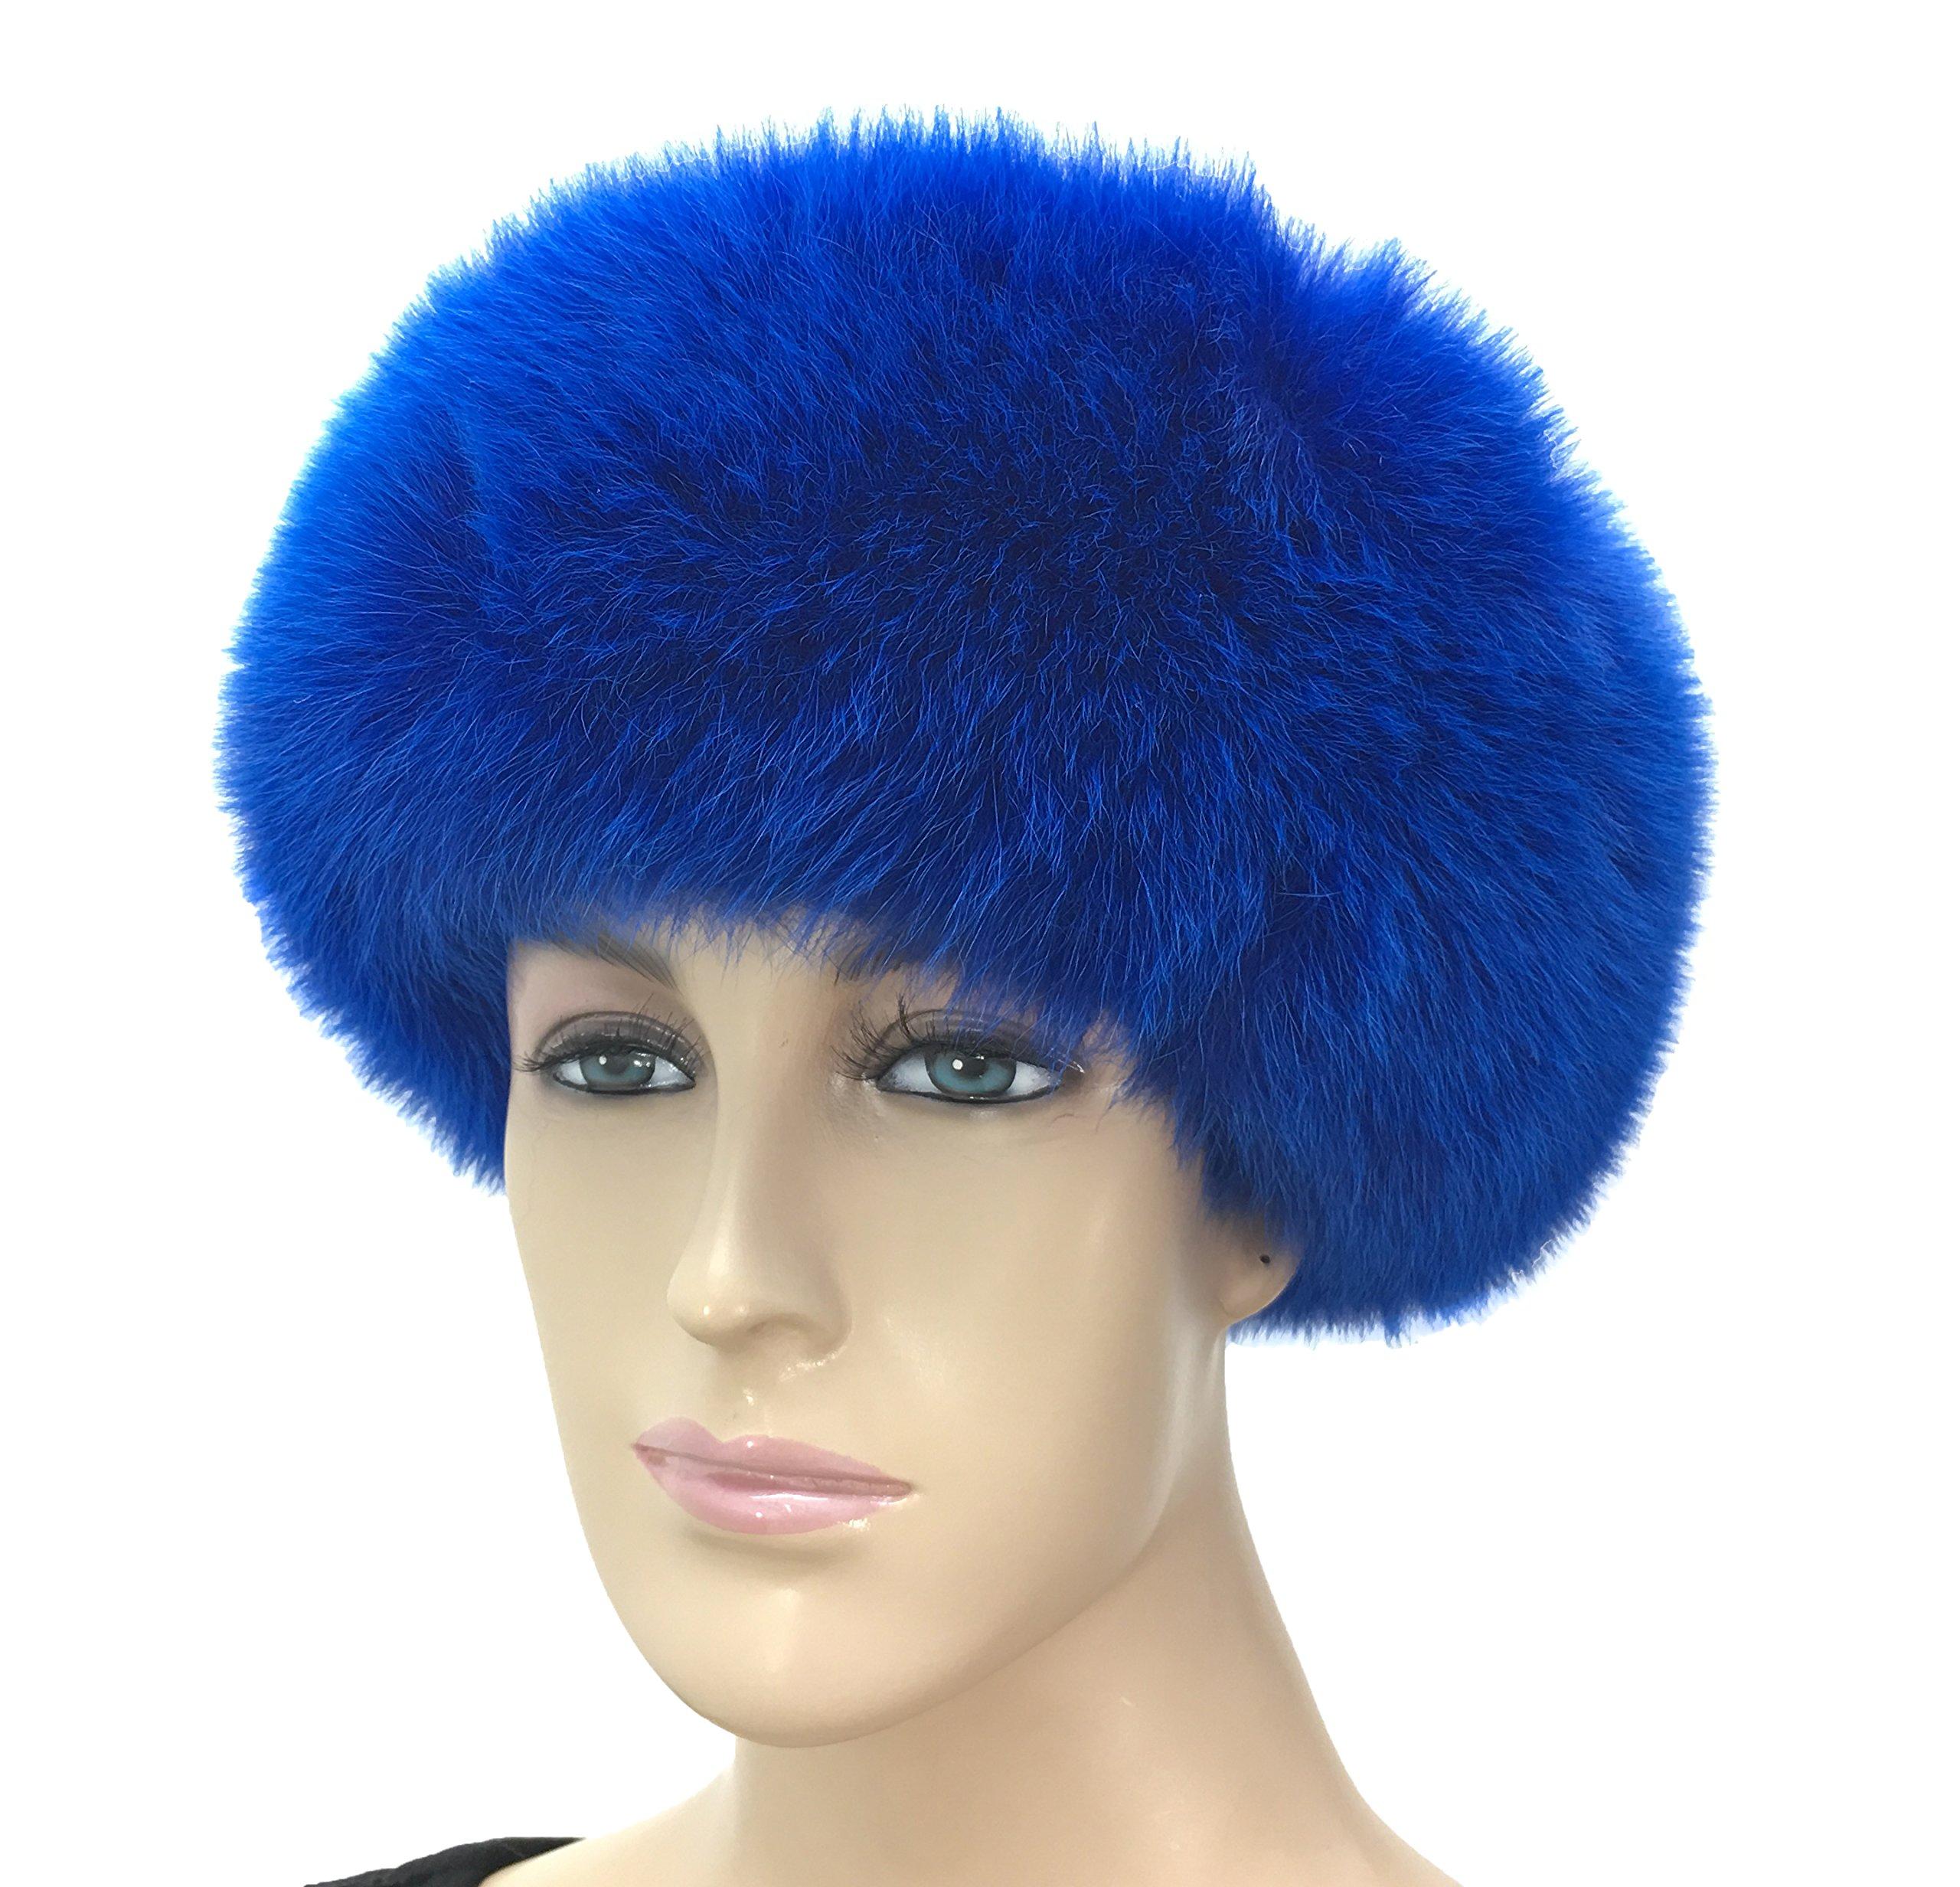 HIMA 100% Real Fox Fur Headband (Blue) by Hima